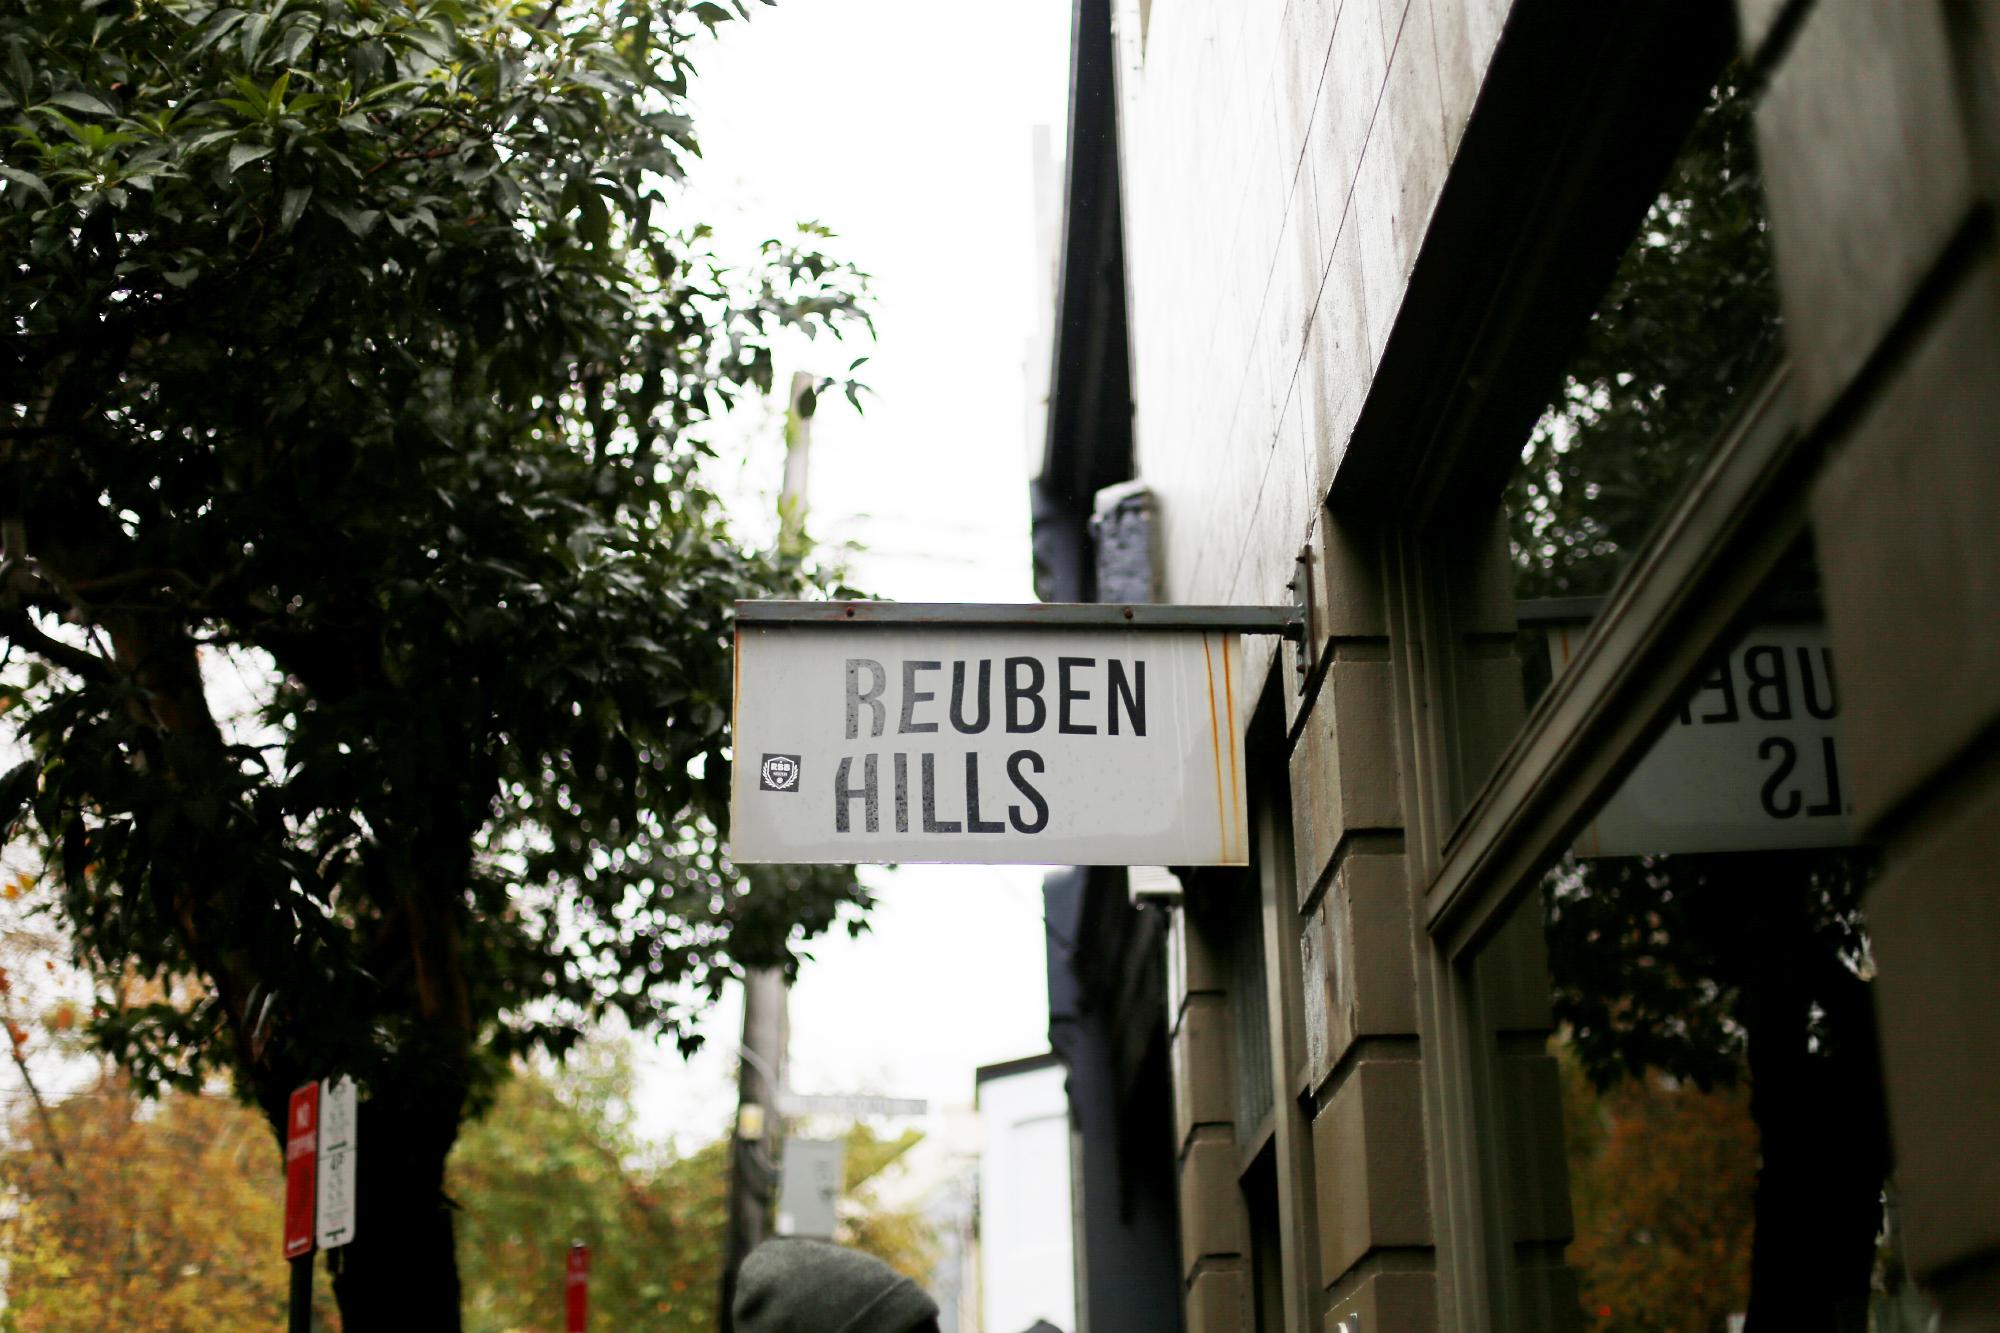 reuben hills sydney